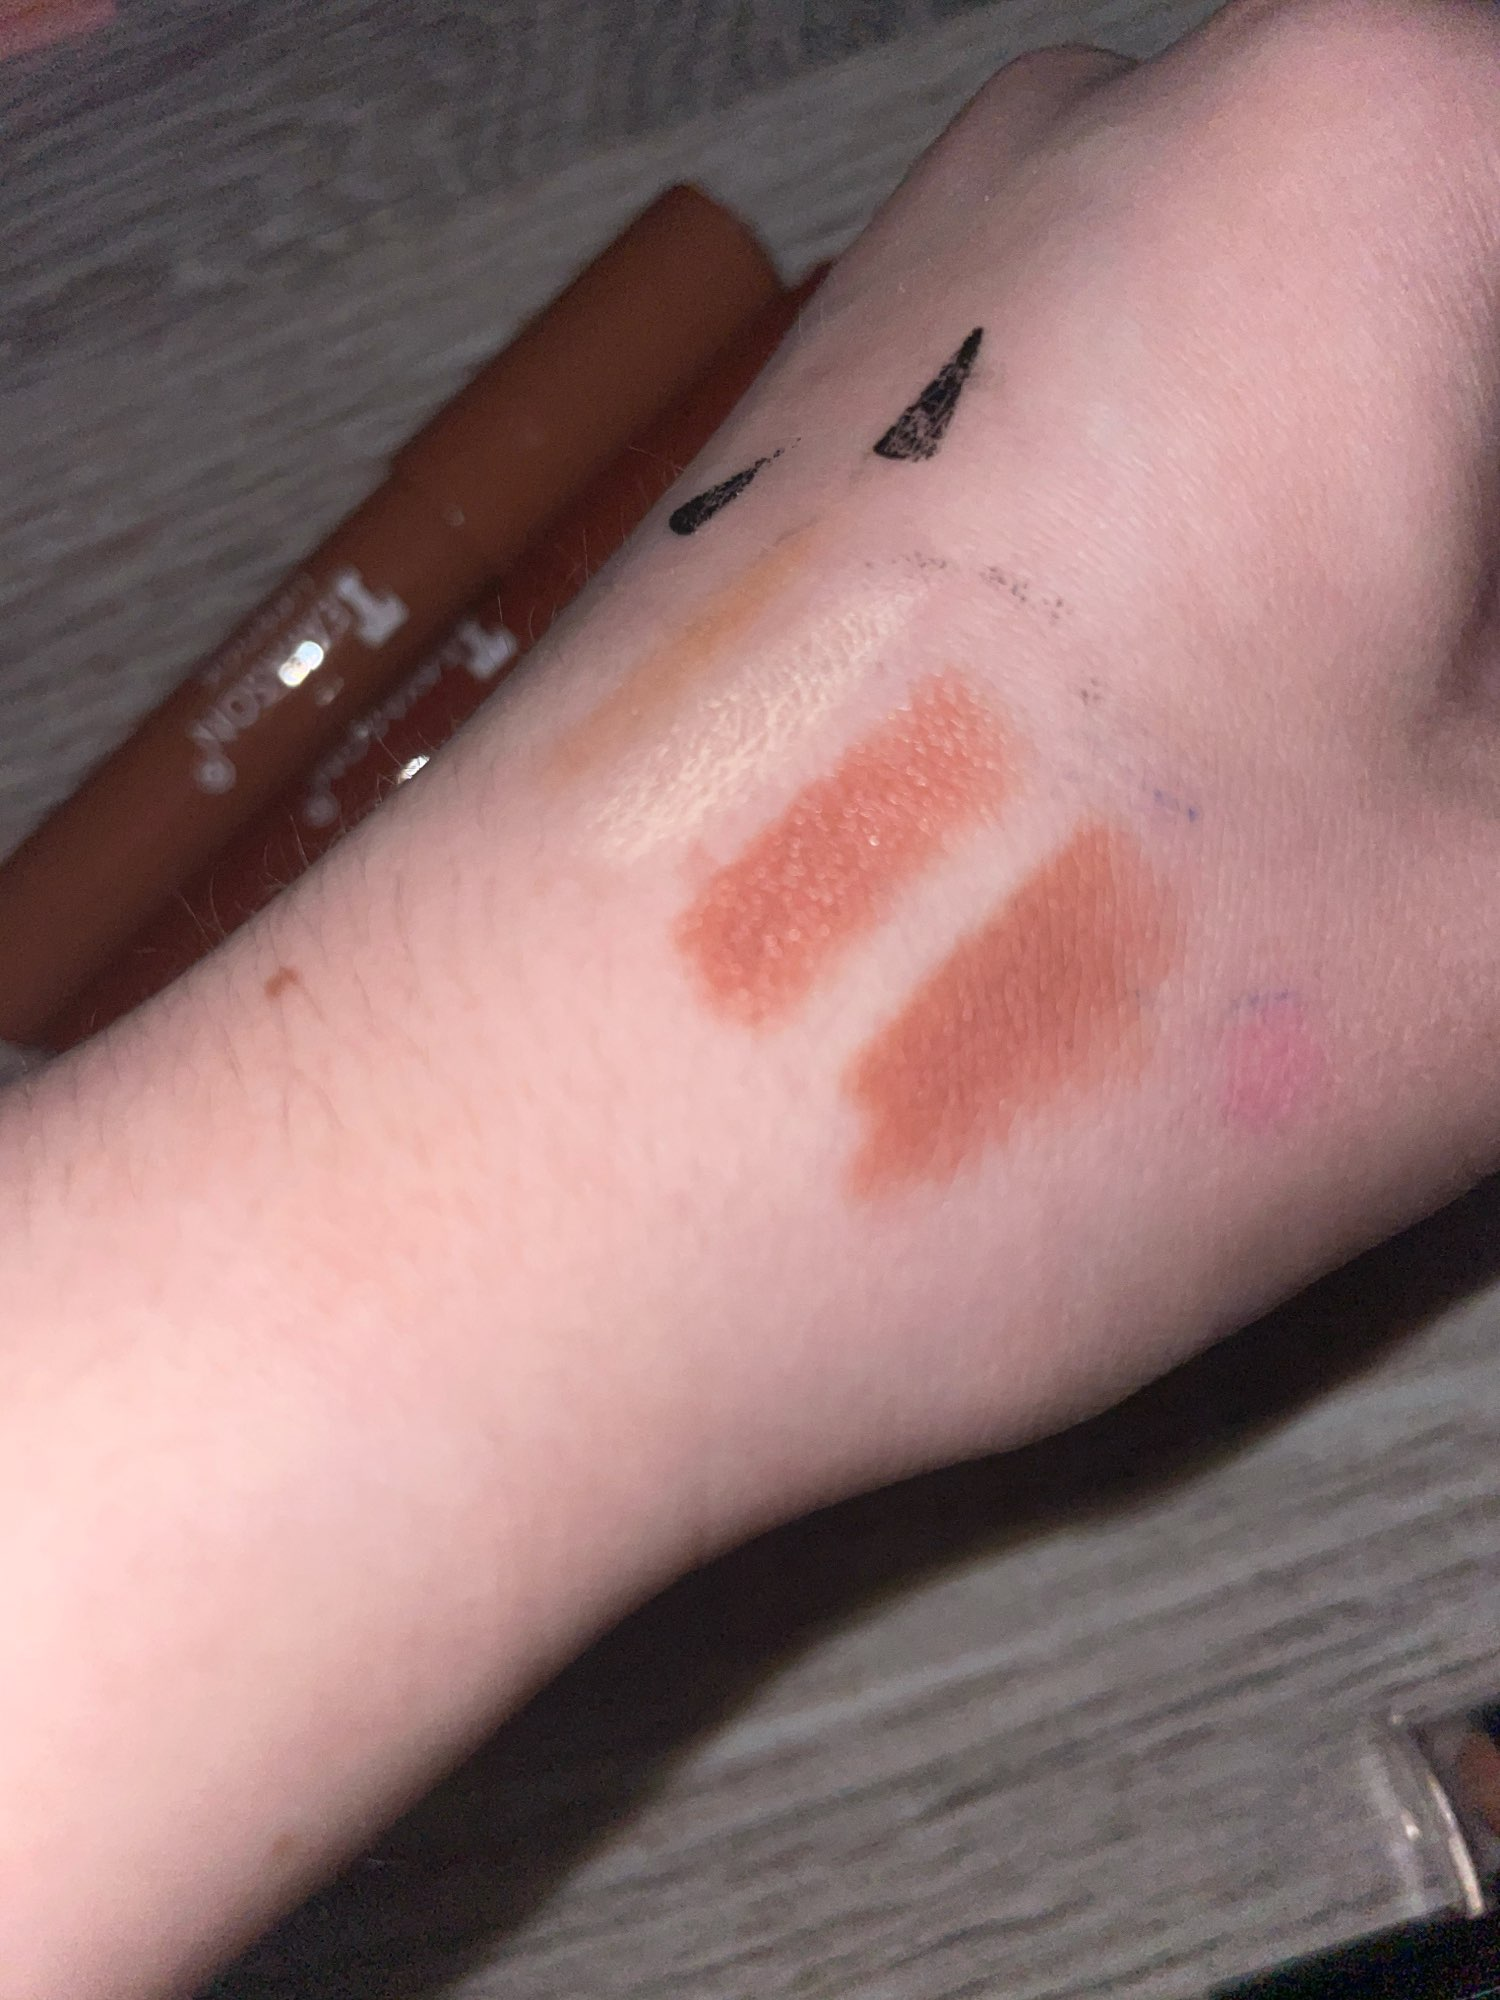 12 Colors Matte Lipstick Lips Waterproof Maquillaje Maquiagem Long Lasting Sexy Non-Stick Cup Make Up Beauty Cosmetics TSLM1 photo review